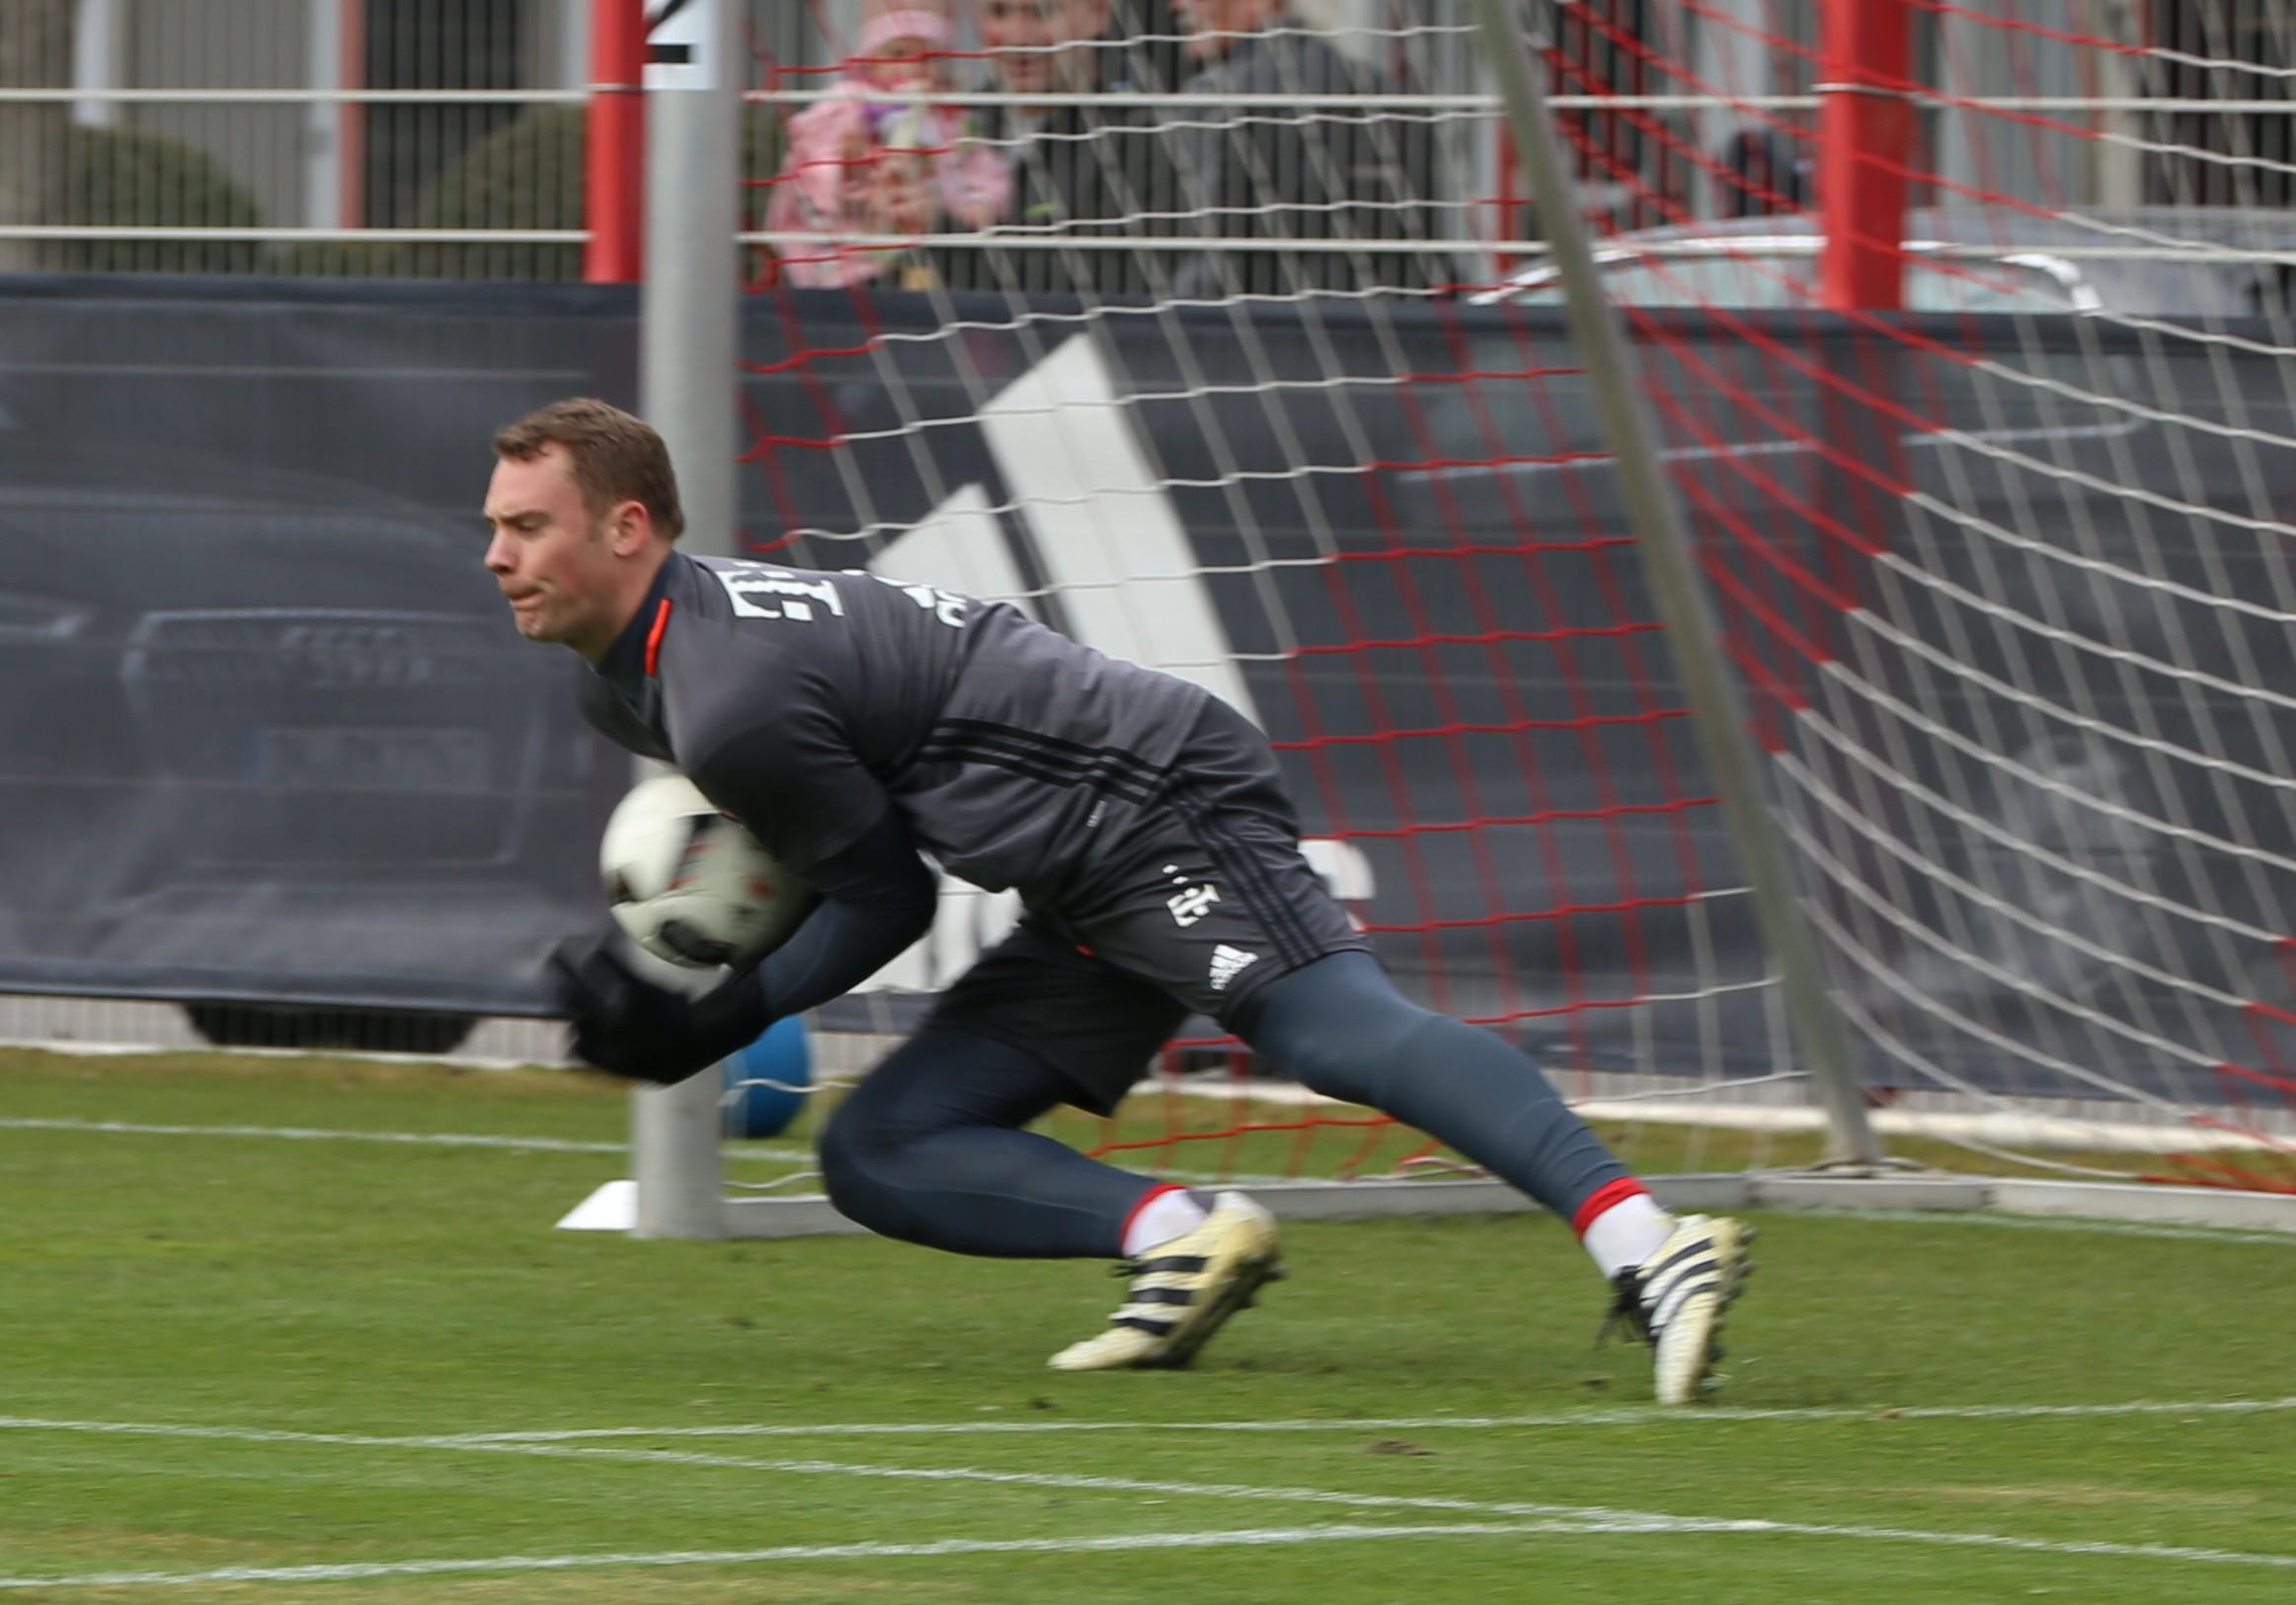 Bundesliga clubs return to training